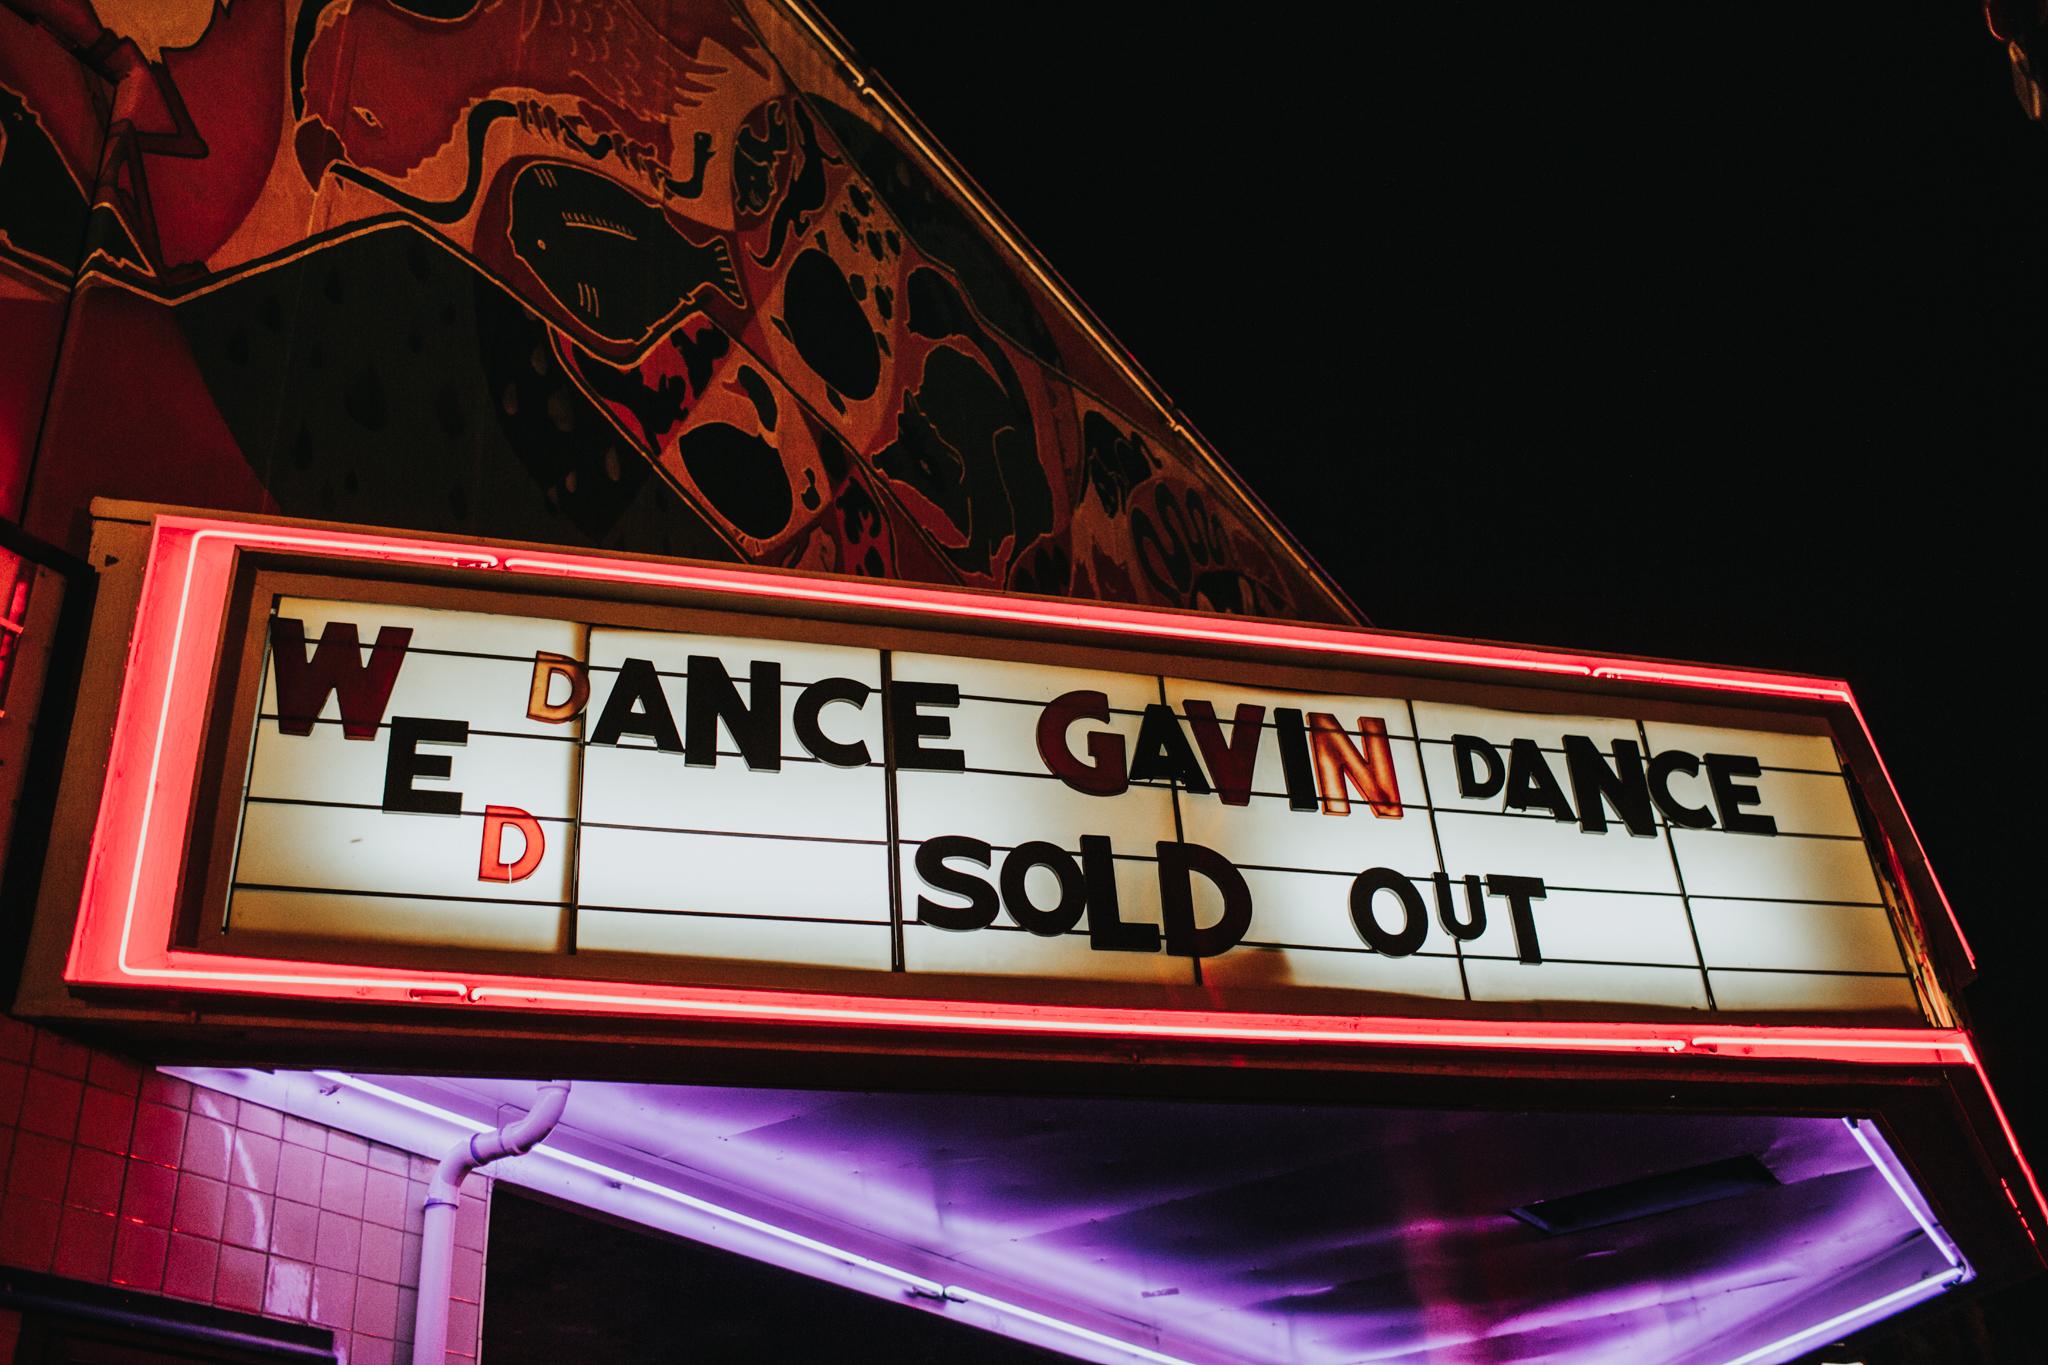 Lafferty Photo - Dance Gavin Dance 03.08.17-7943.jpg